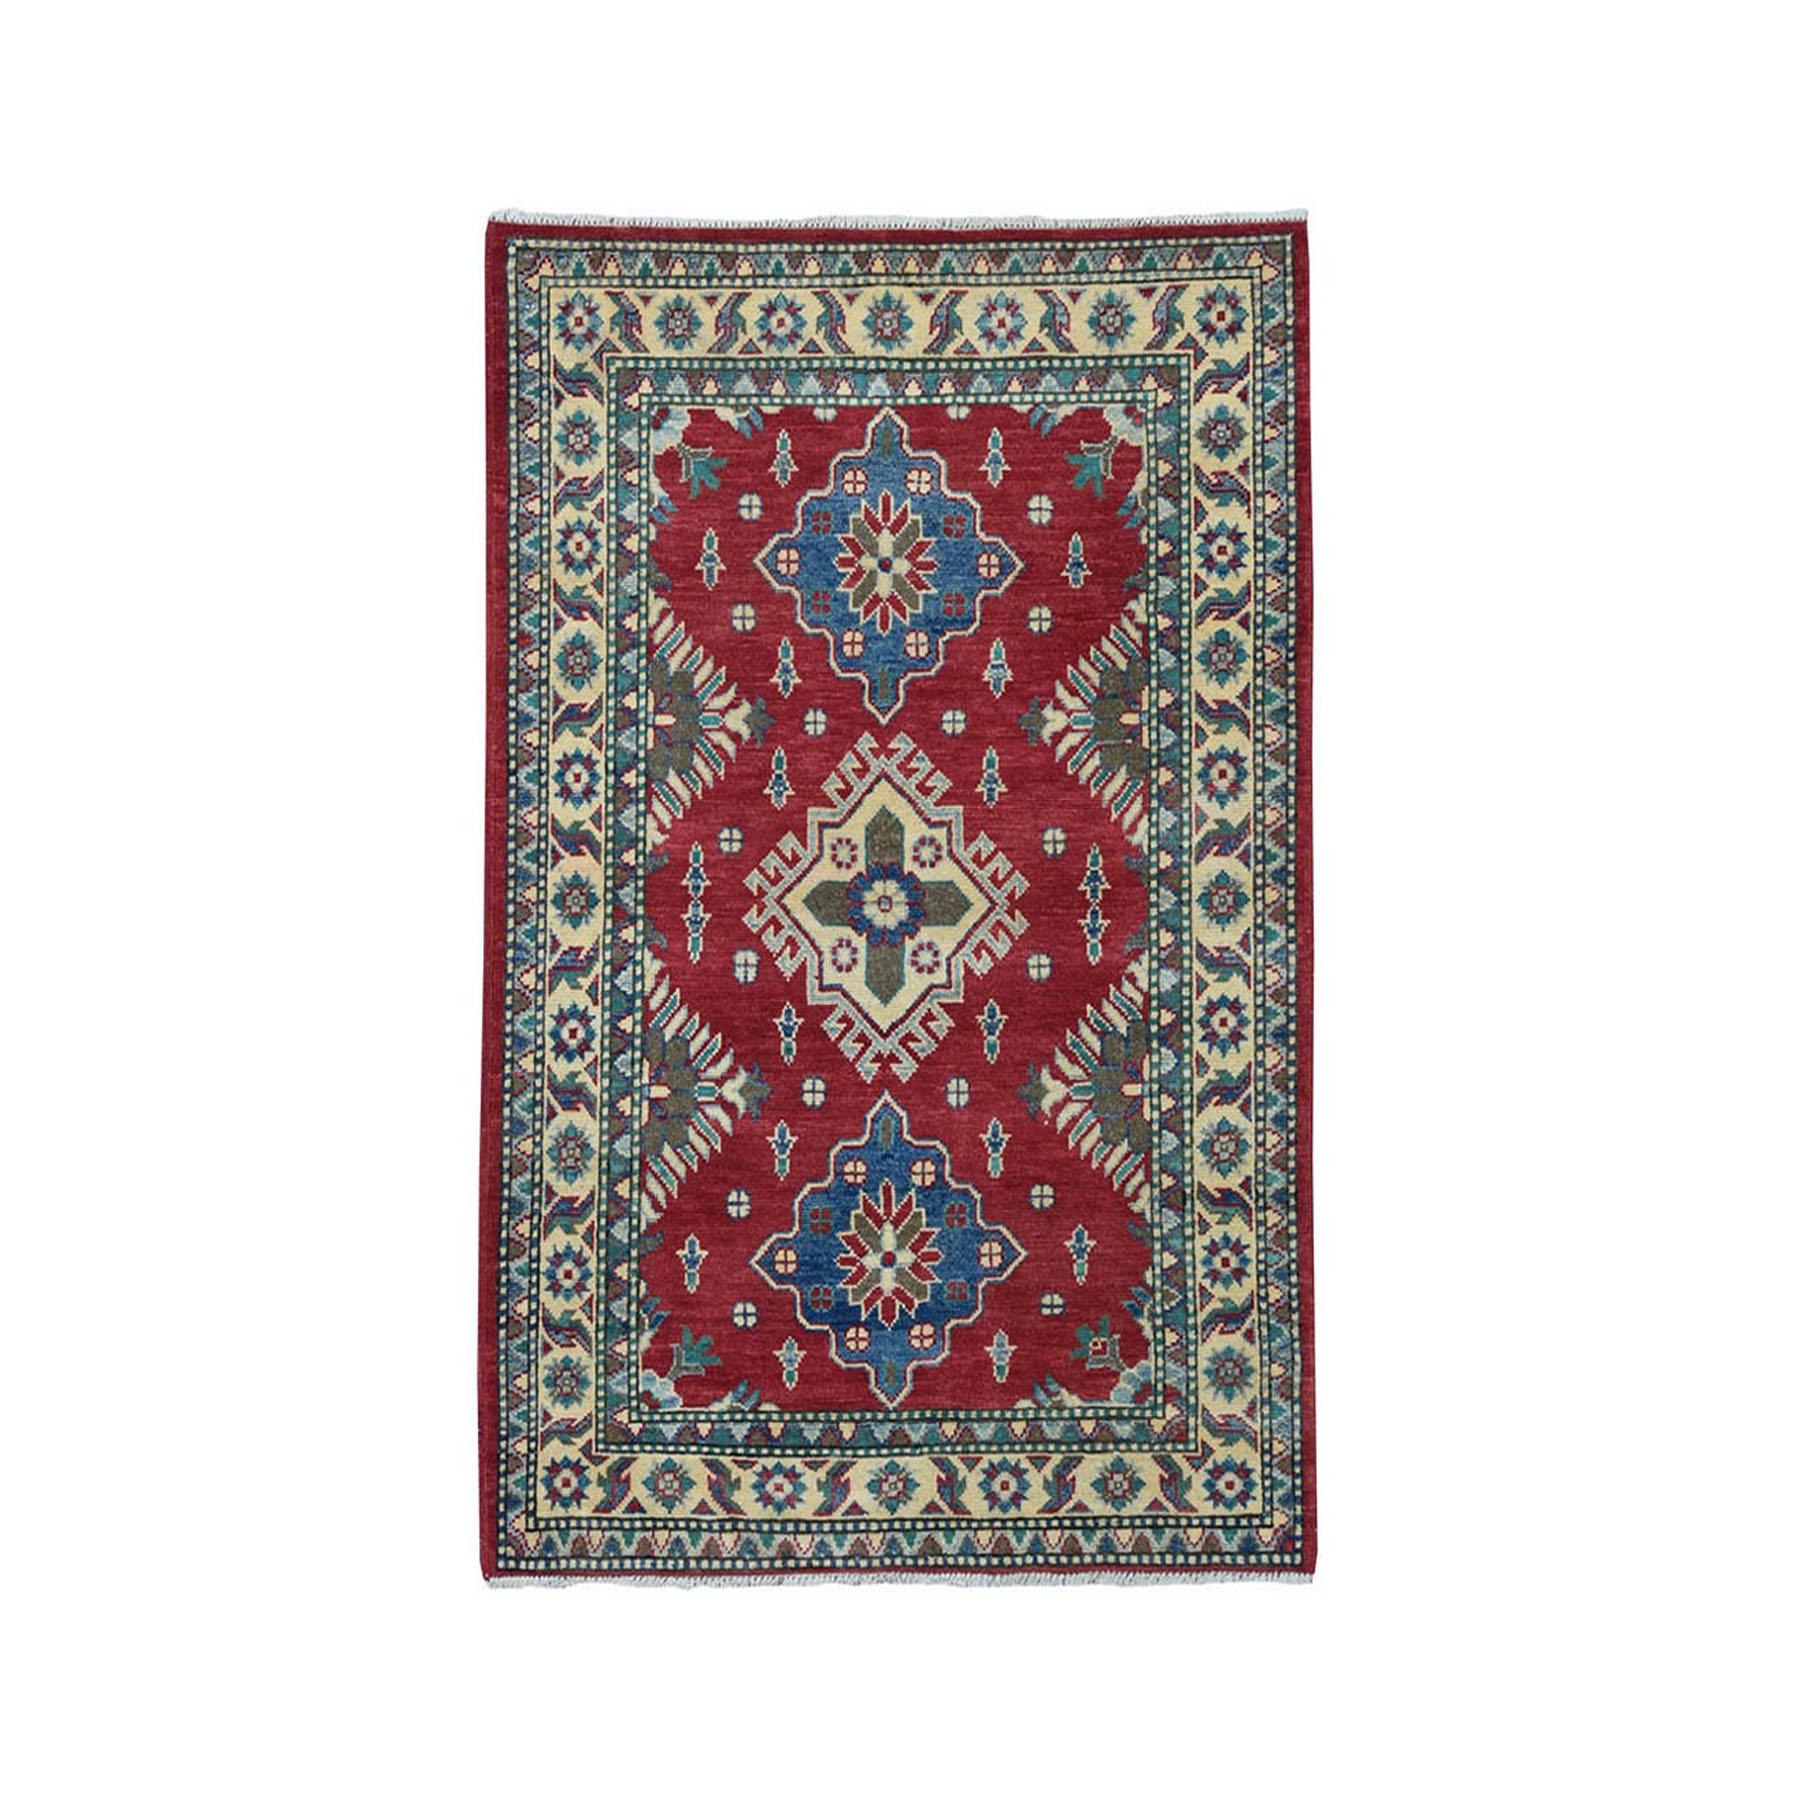 "3'4""X4'9"" Red Kazak Pure Wool Geometric Design Hand-Knotted Oriental Rug"